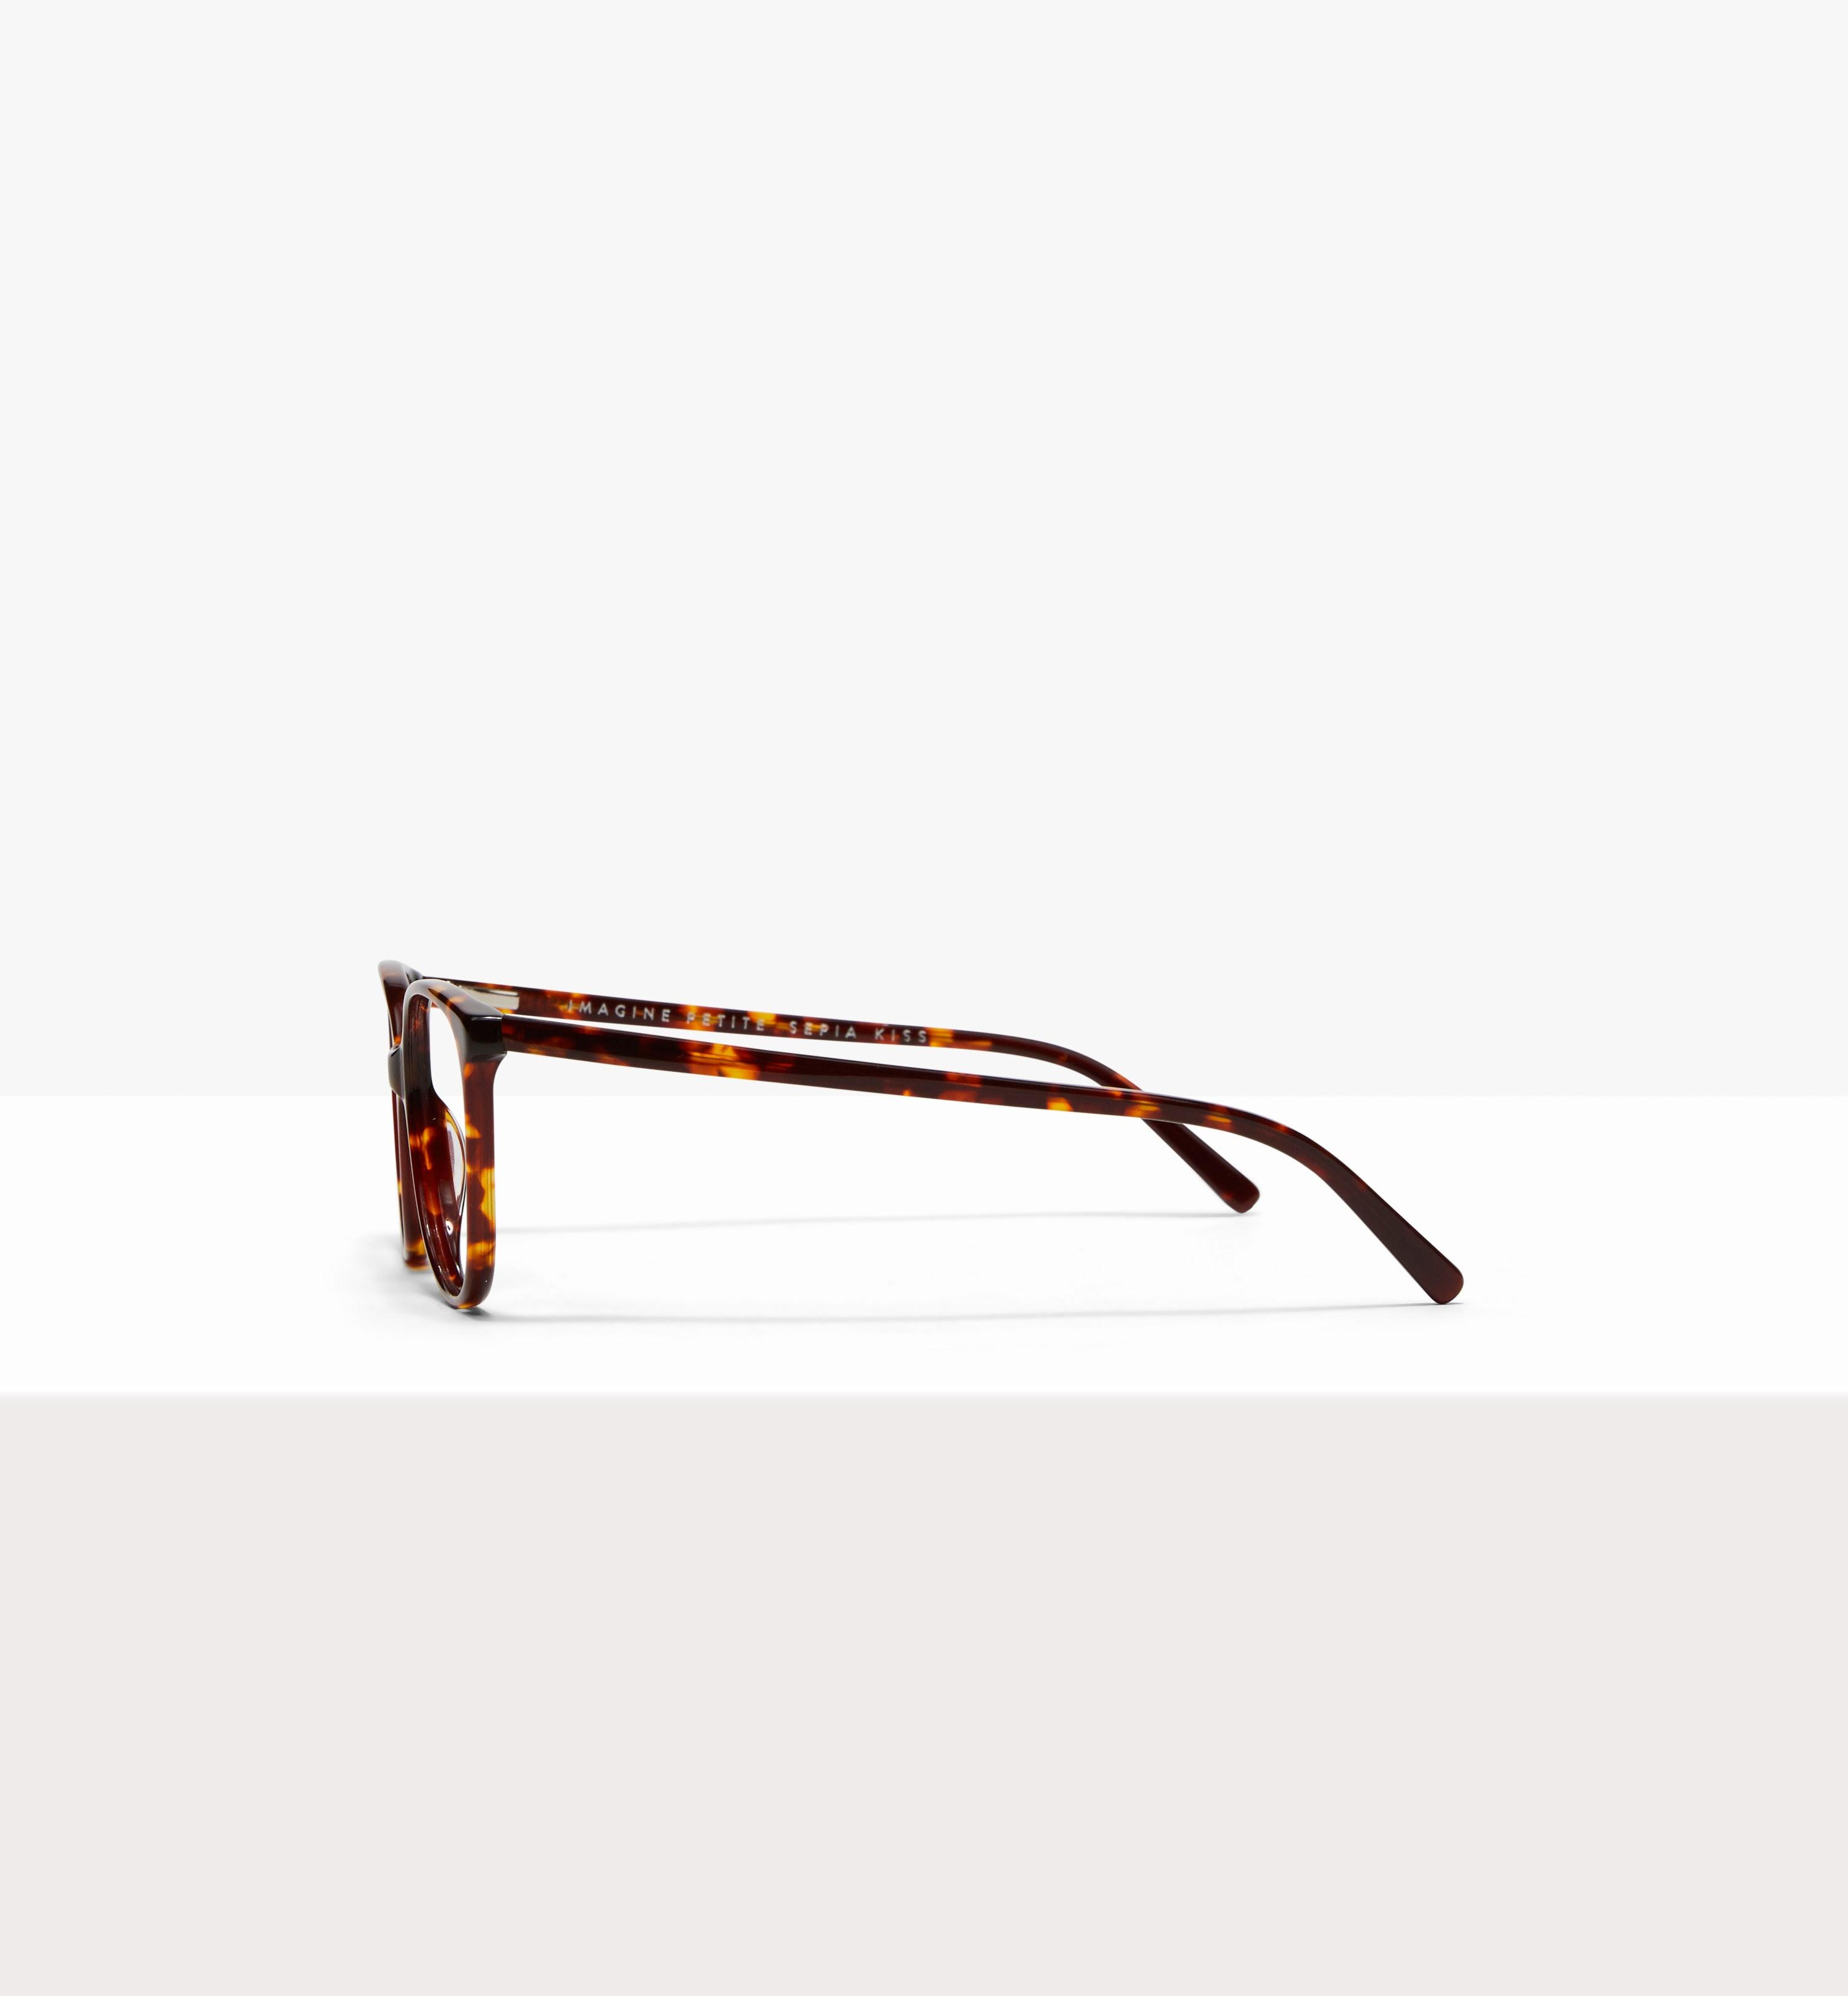 Affordable Fashion Glasses Cat Eye Eyeglasses Women Imagine Petite Sepia Kiss Side